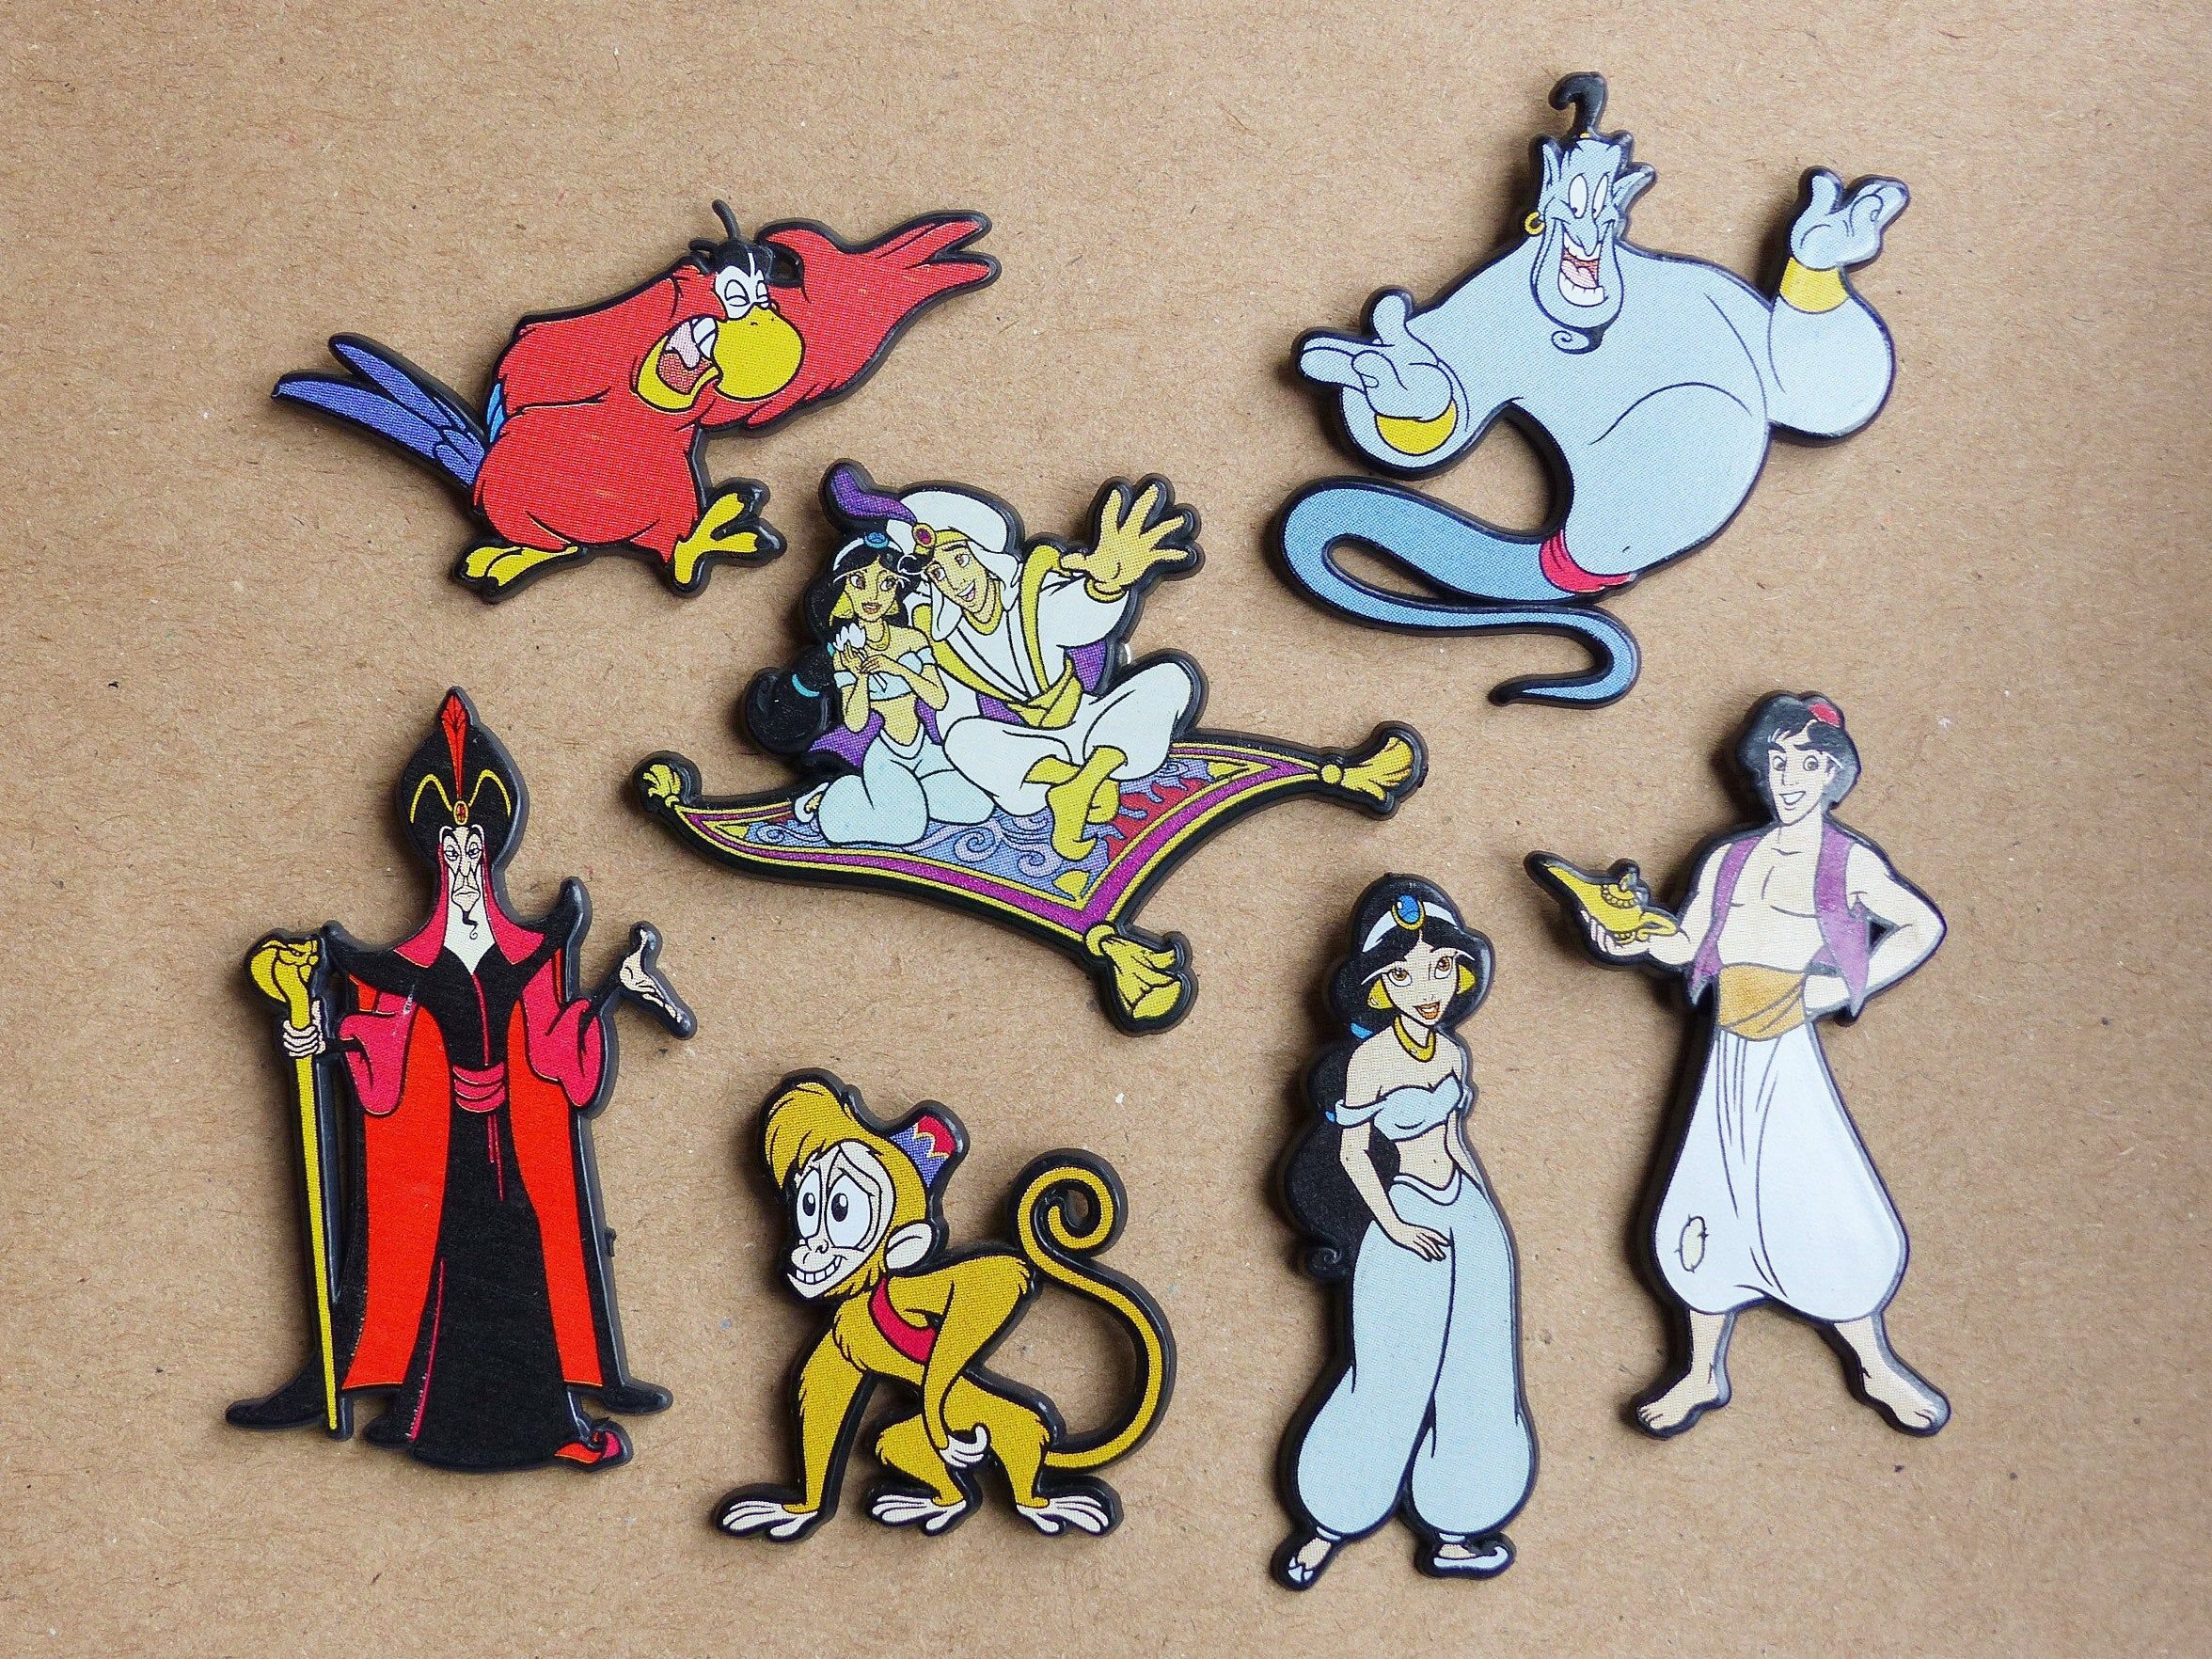 Vintage 90 S Disney Aladdin Plastic Badges Etsy In 2020 Nostalgic Gifts Disney Aladdin Magic Carpet